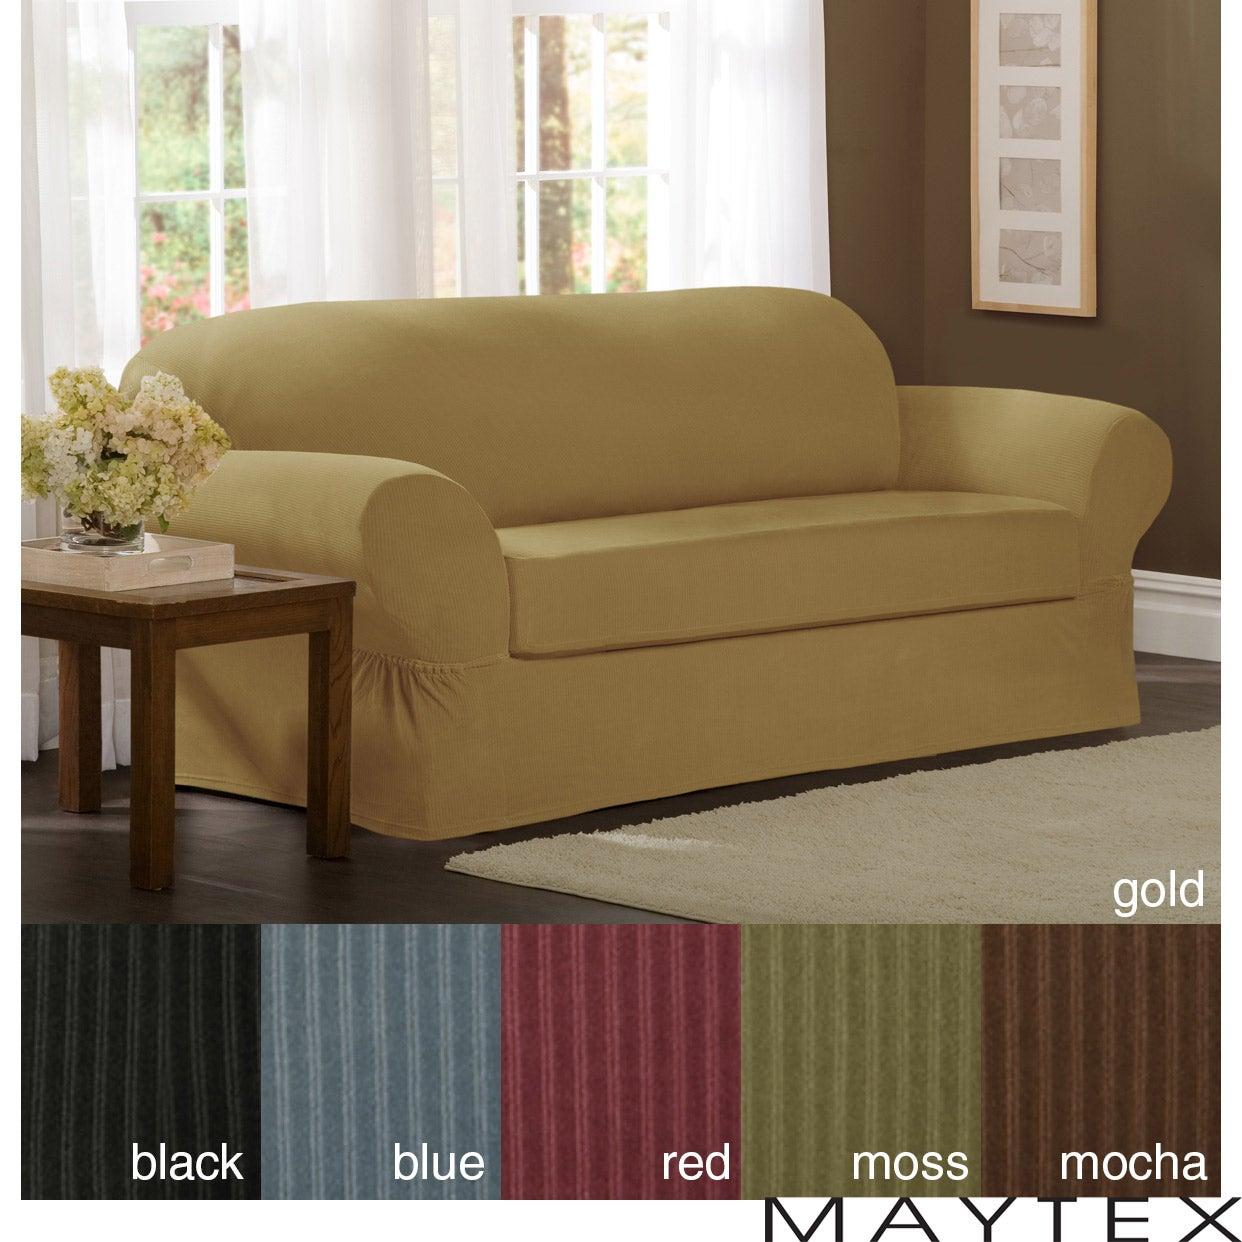 Maytex Collin 2 Piece Sofa Slipcover Overstock Shopping